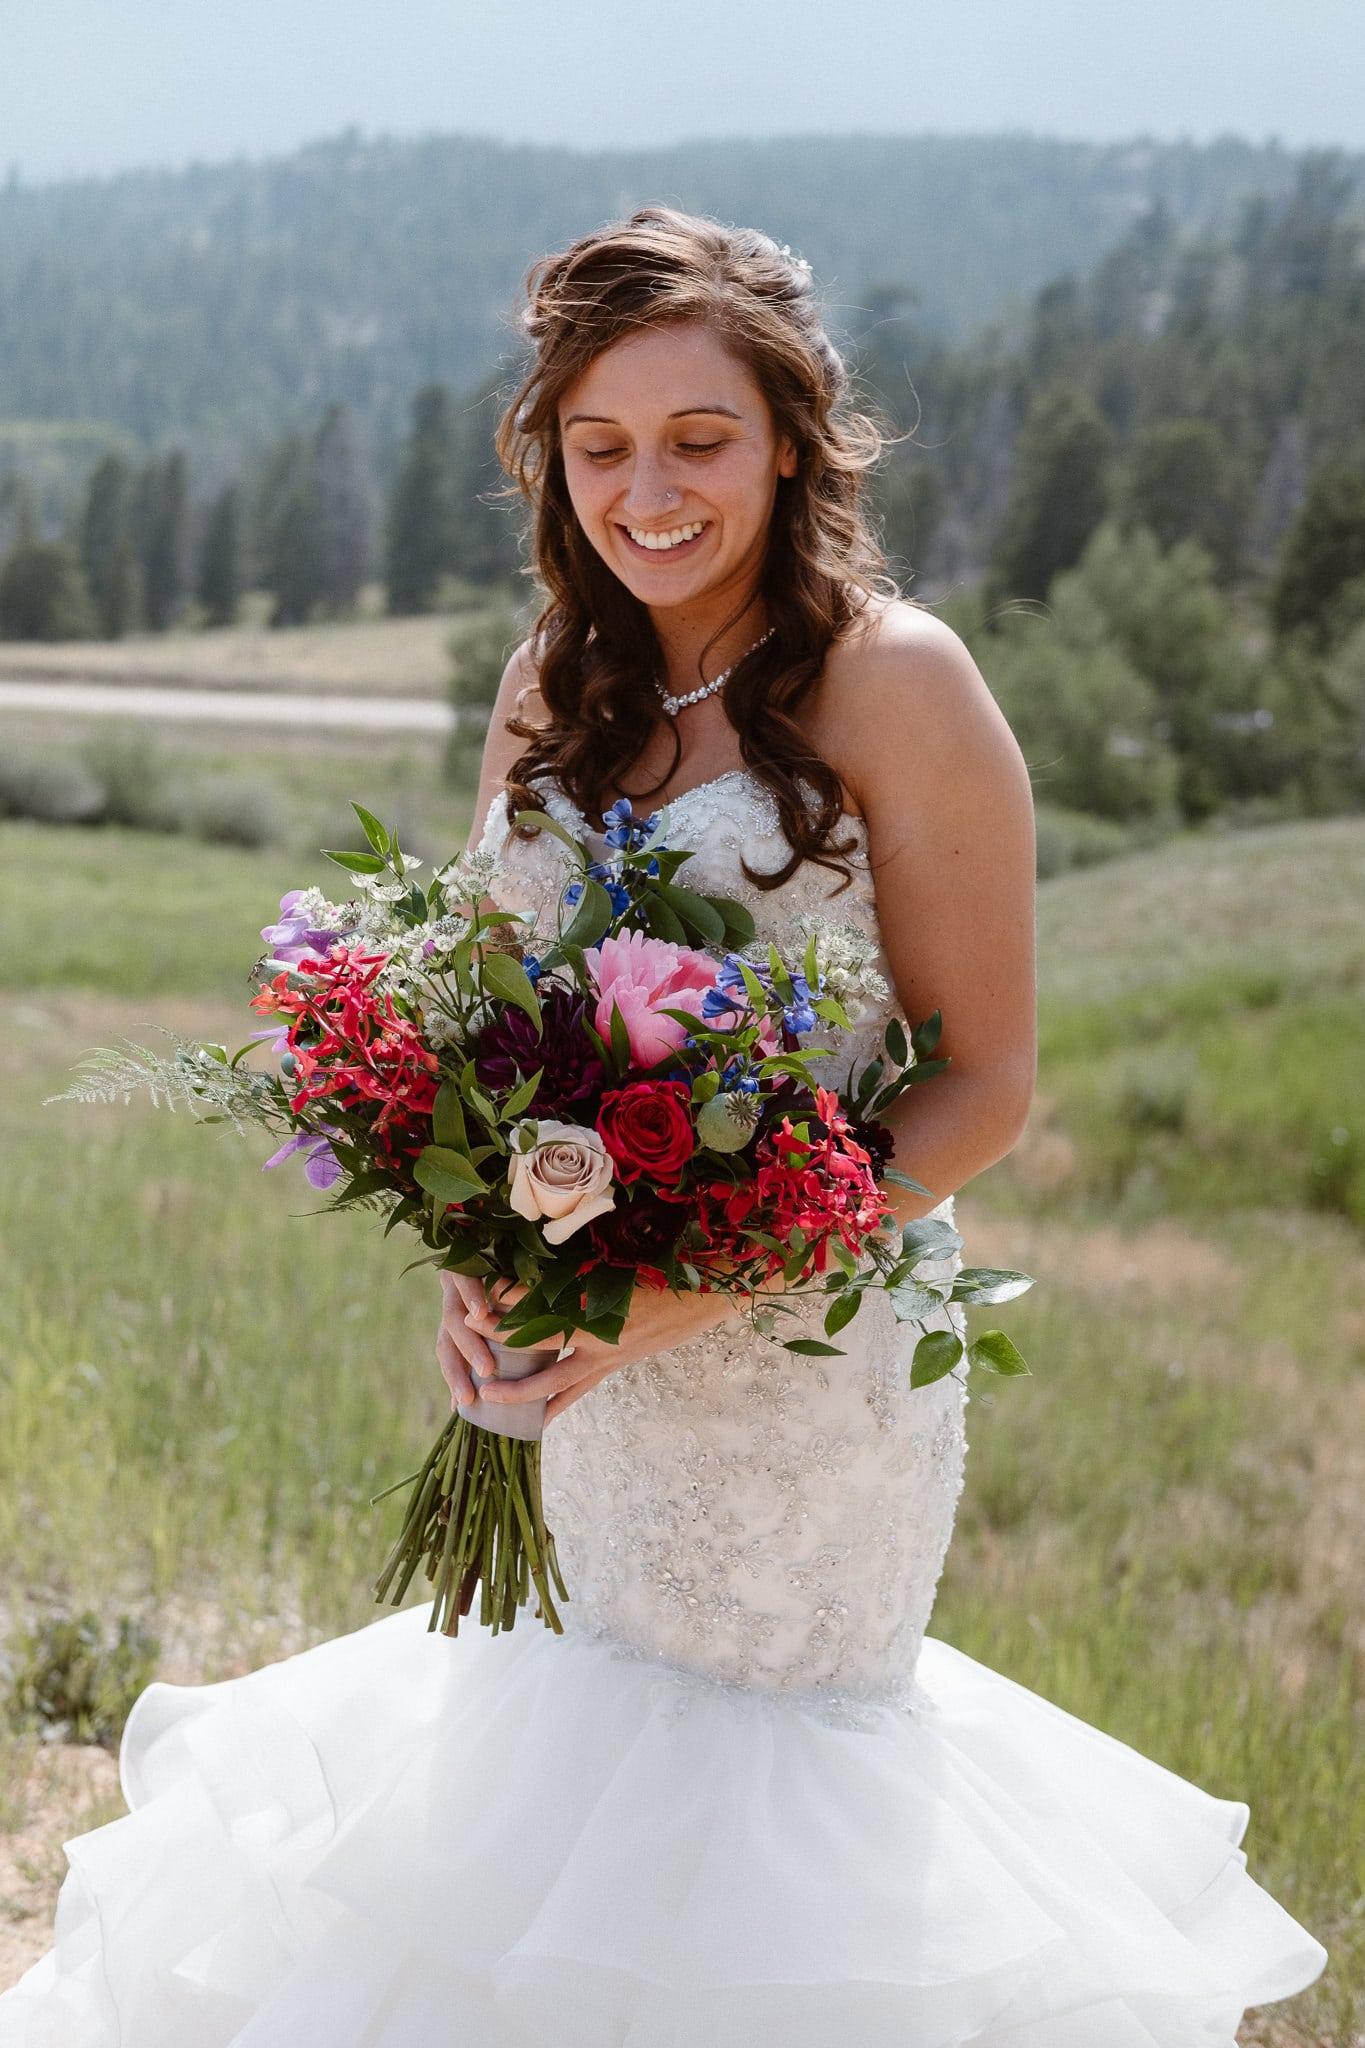 Dao House wedding photographer, Estes Park wedding venue, Colorado mountain wedding, bride holding jewel tone wedding bouquet